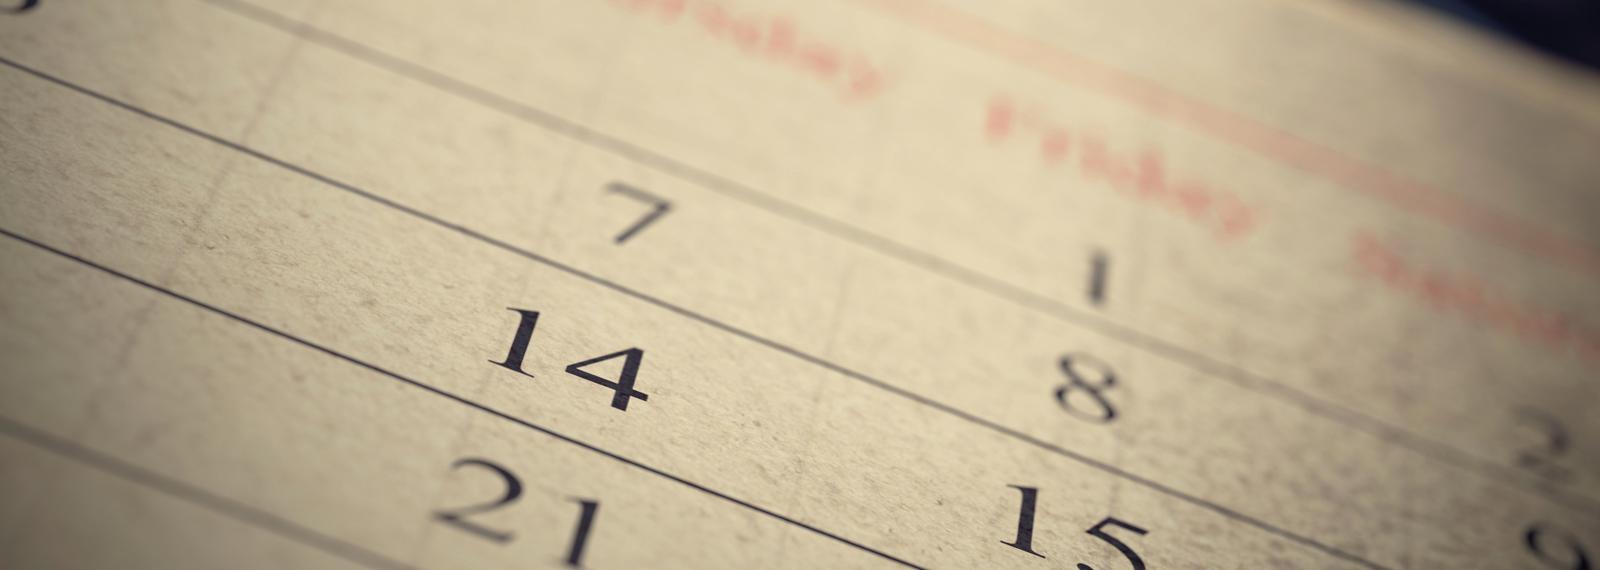 Friday December 7 2020 On Catholic Church Calendar Liturgical Calendar